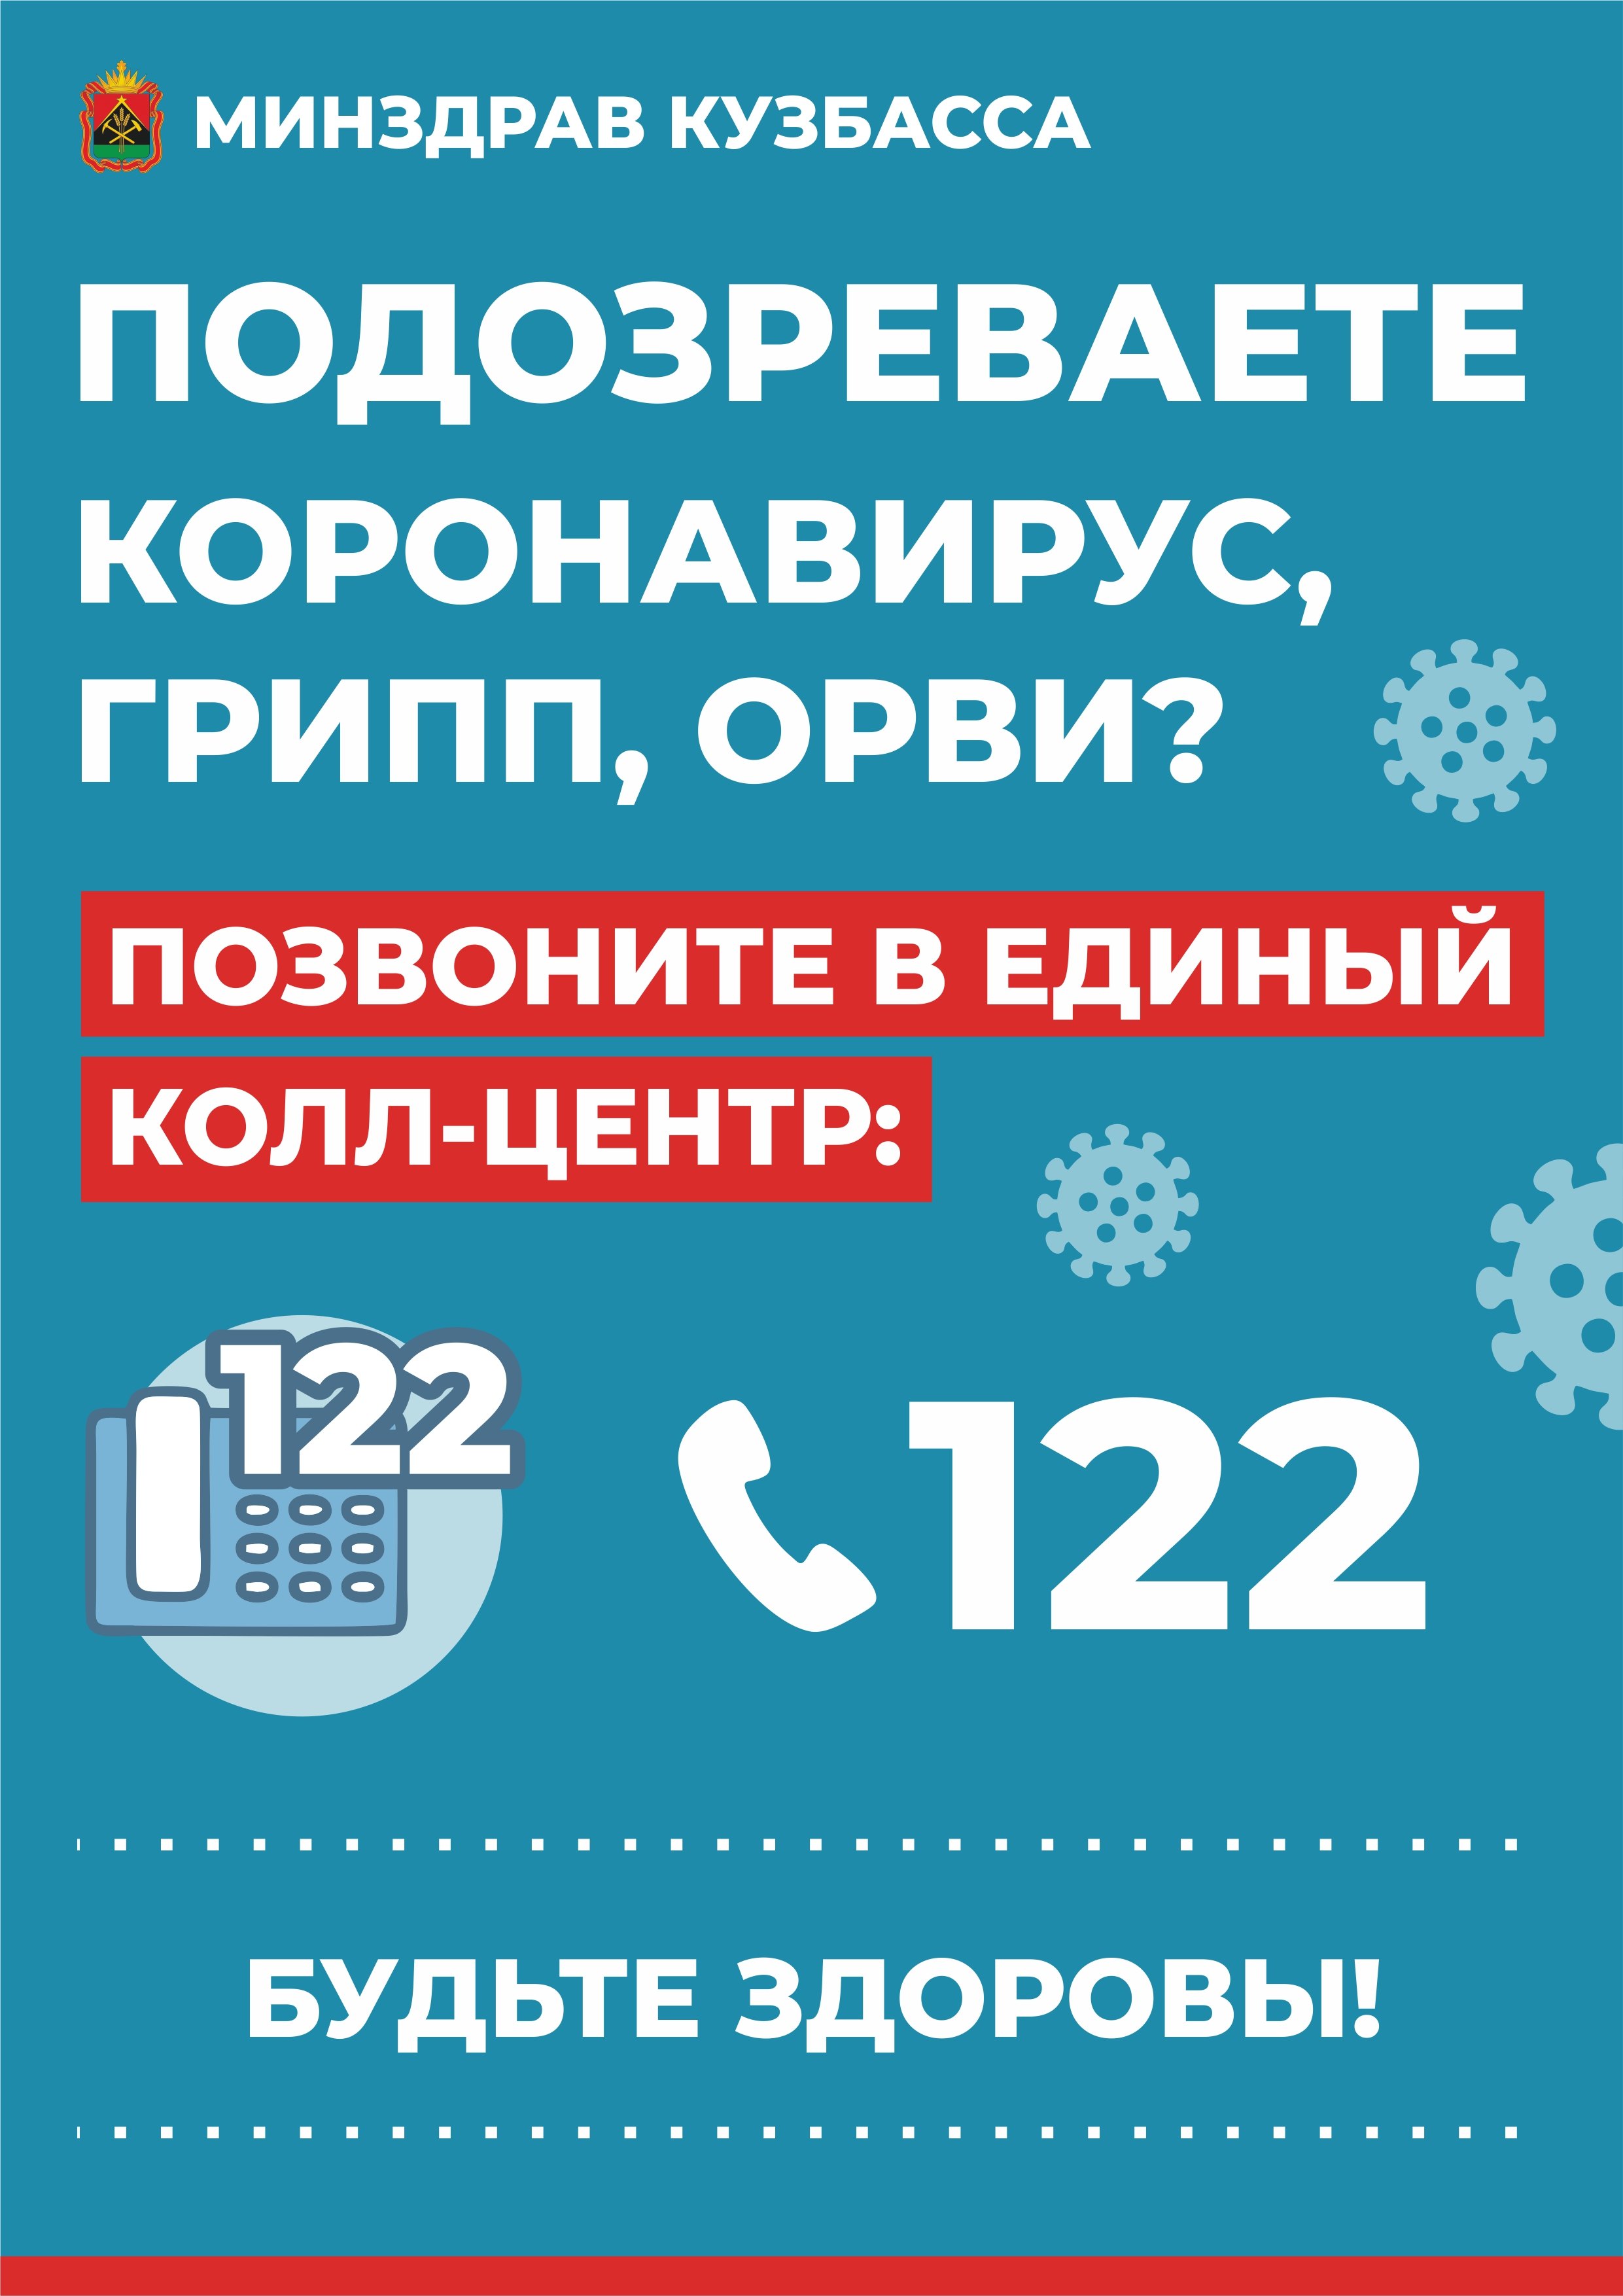 pamjatka_koll_centr.jpg